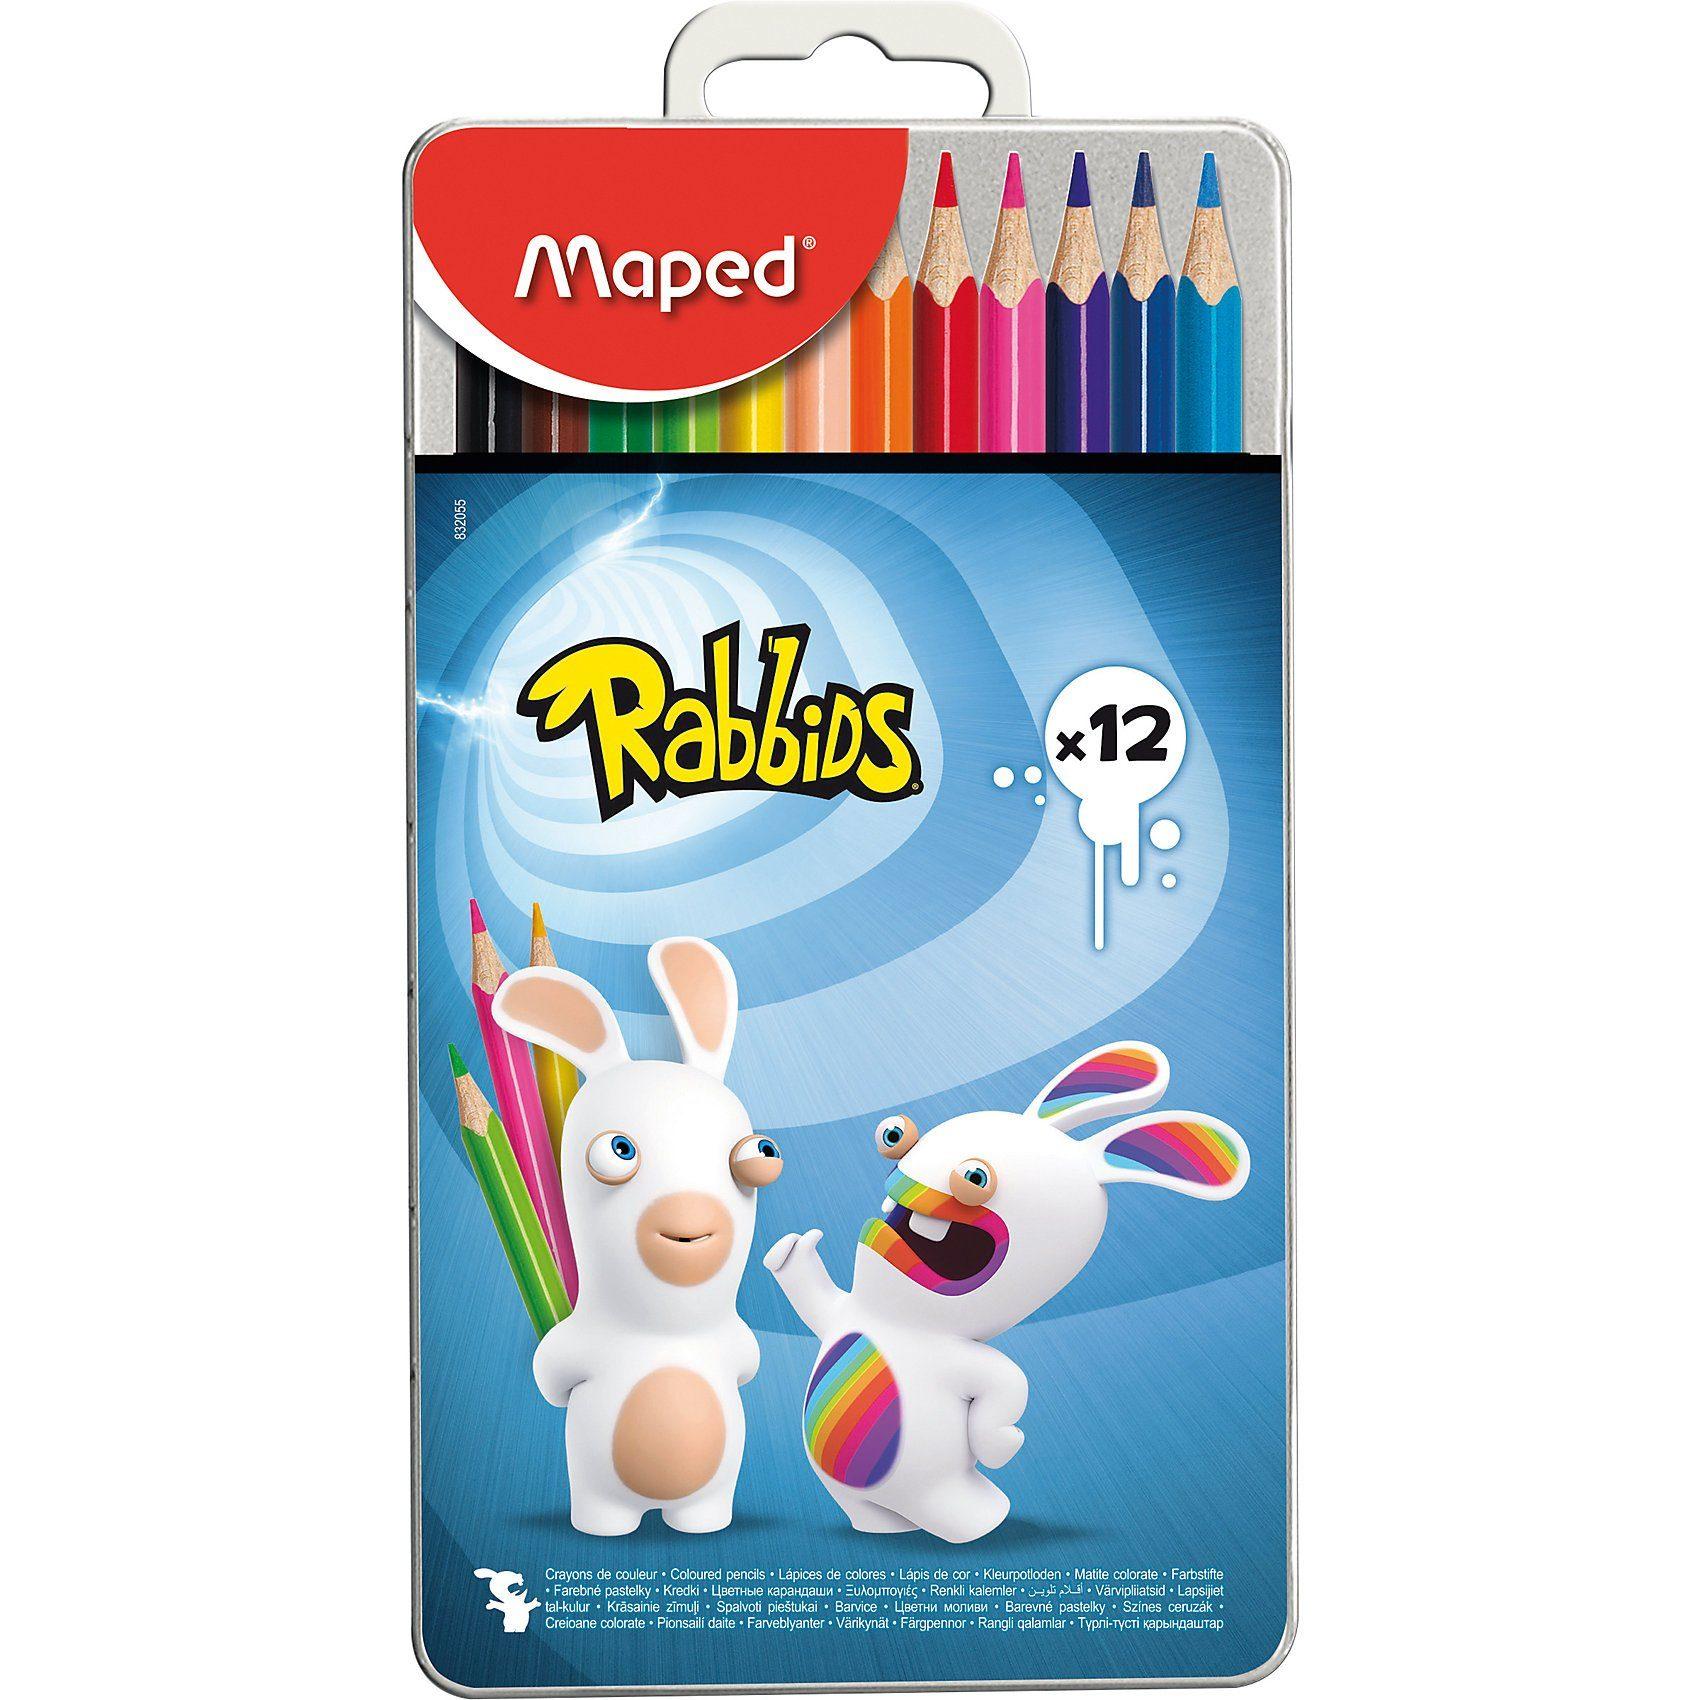 MAPED Rabbids Buntstifte Color Peps Tattoo